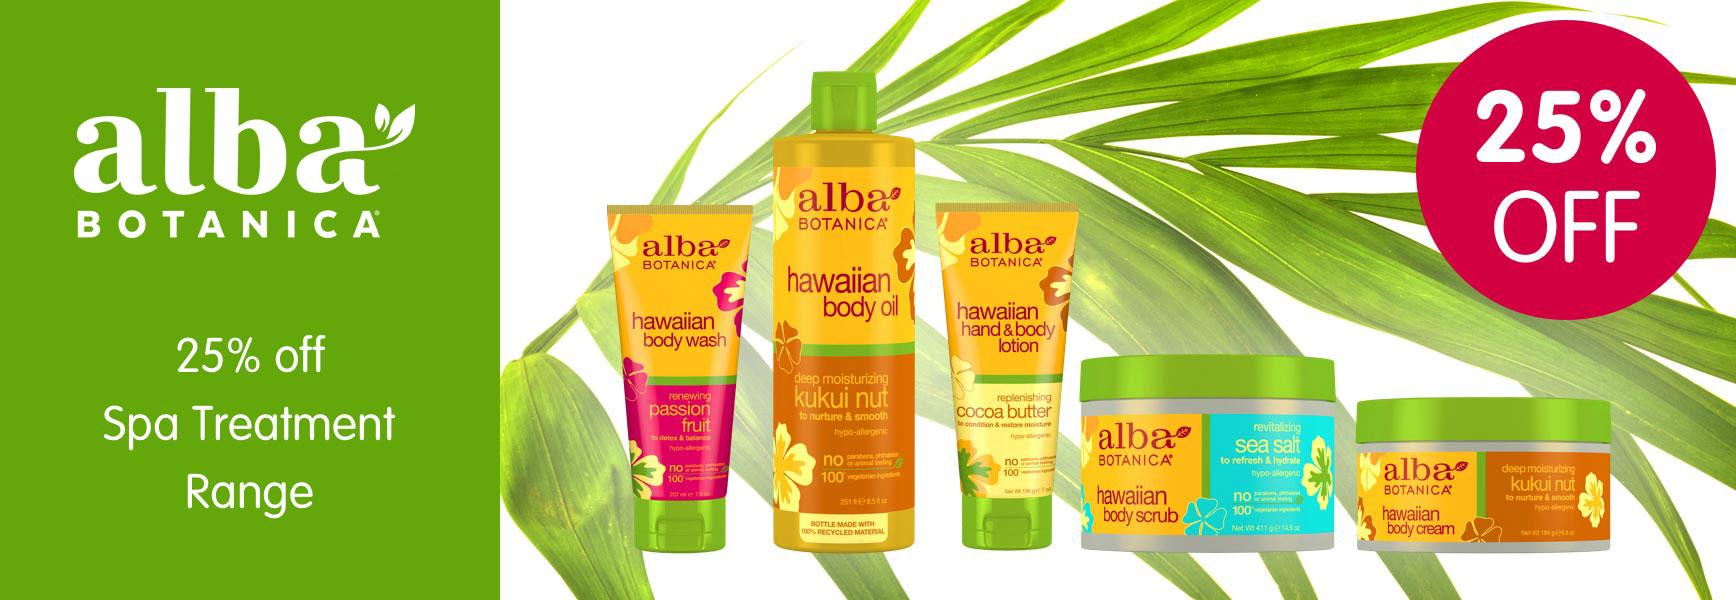 Alba Botanica: natural, 100% vegetarian personal care products